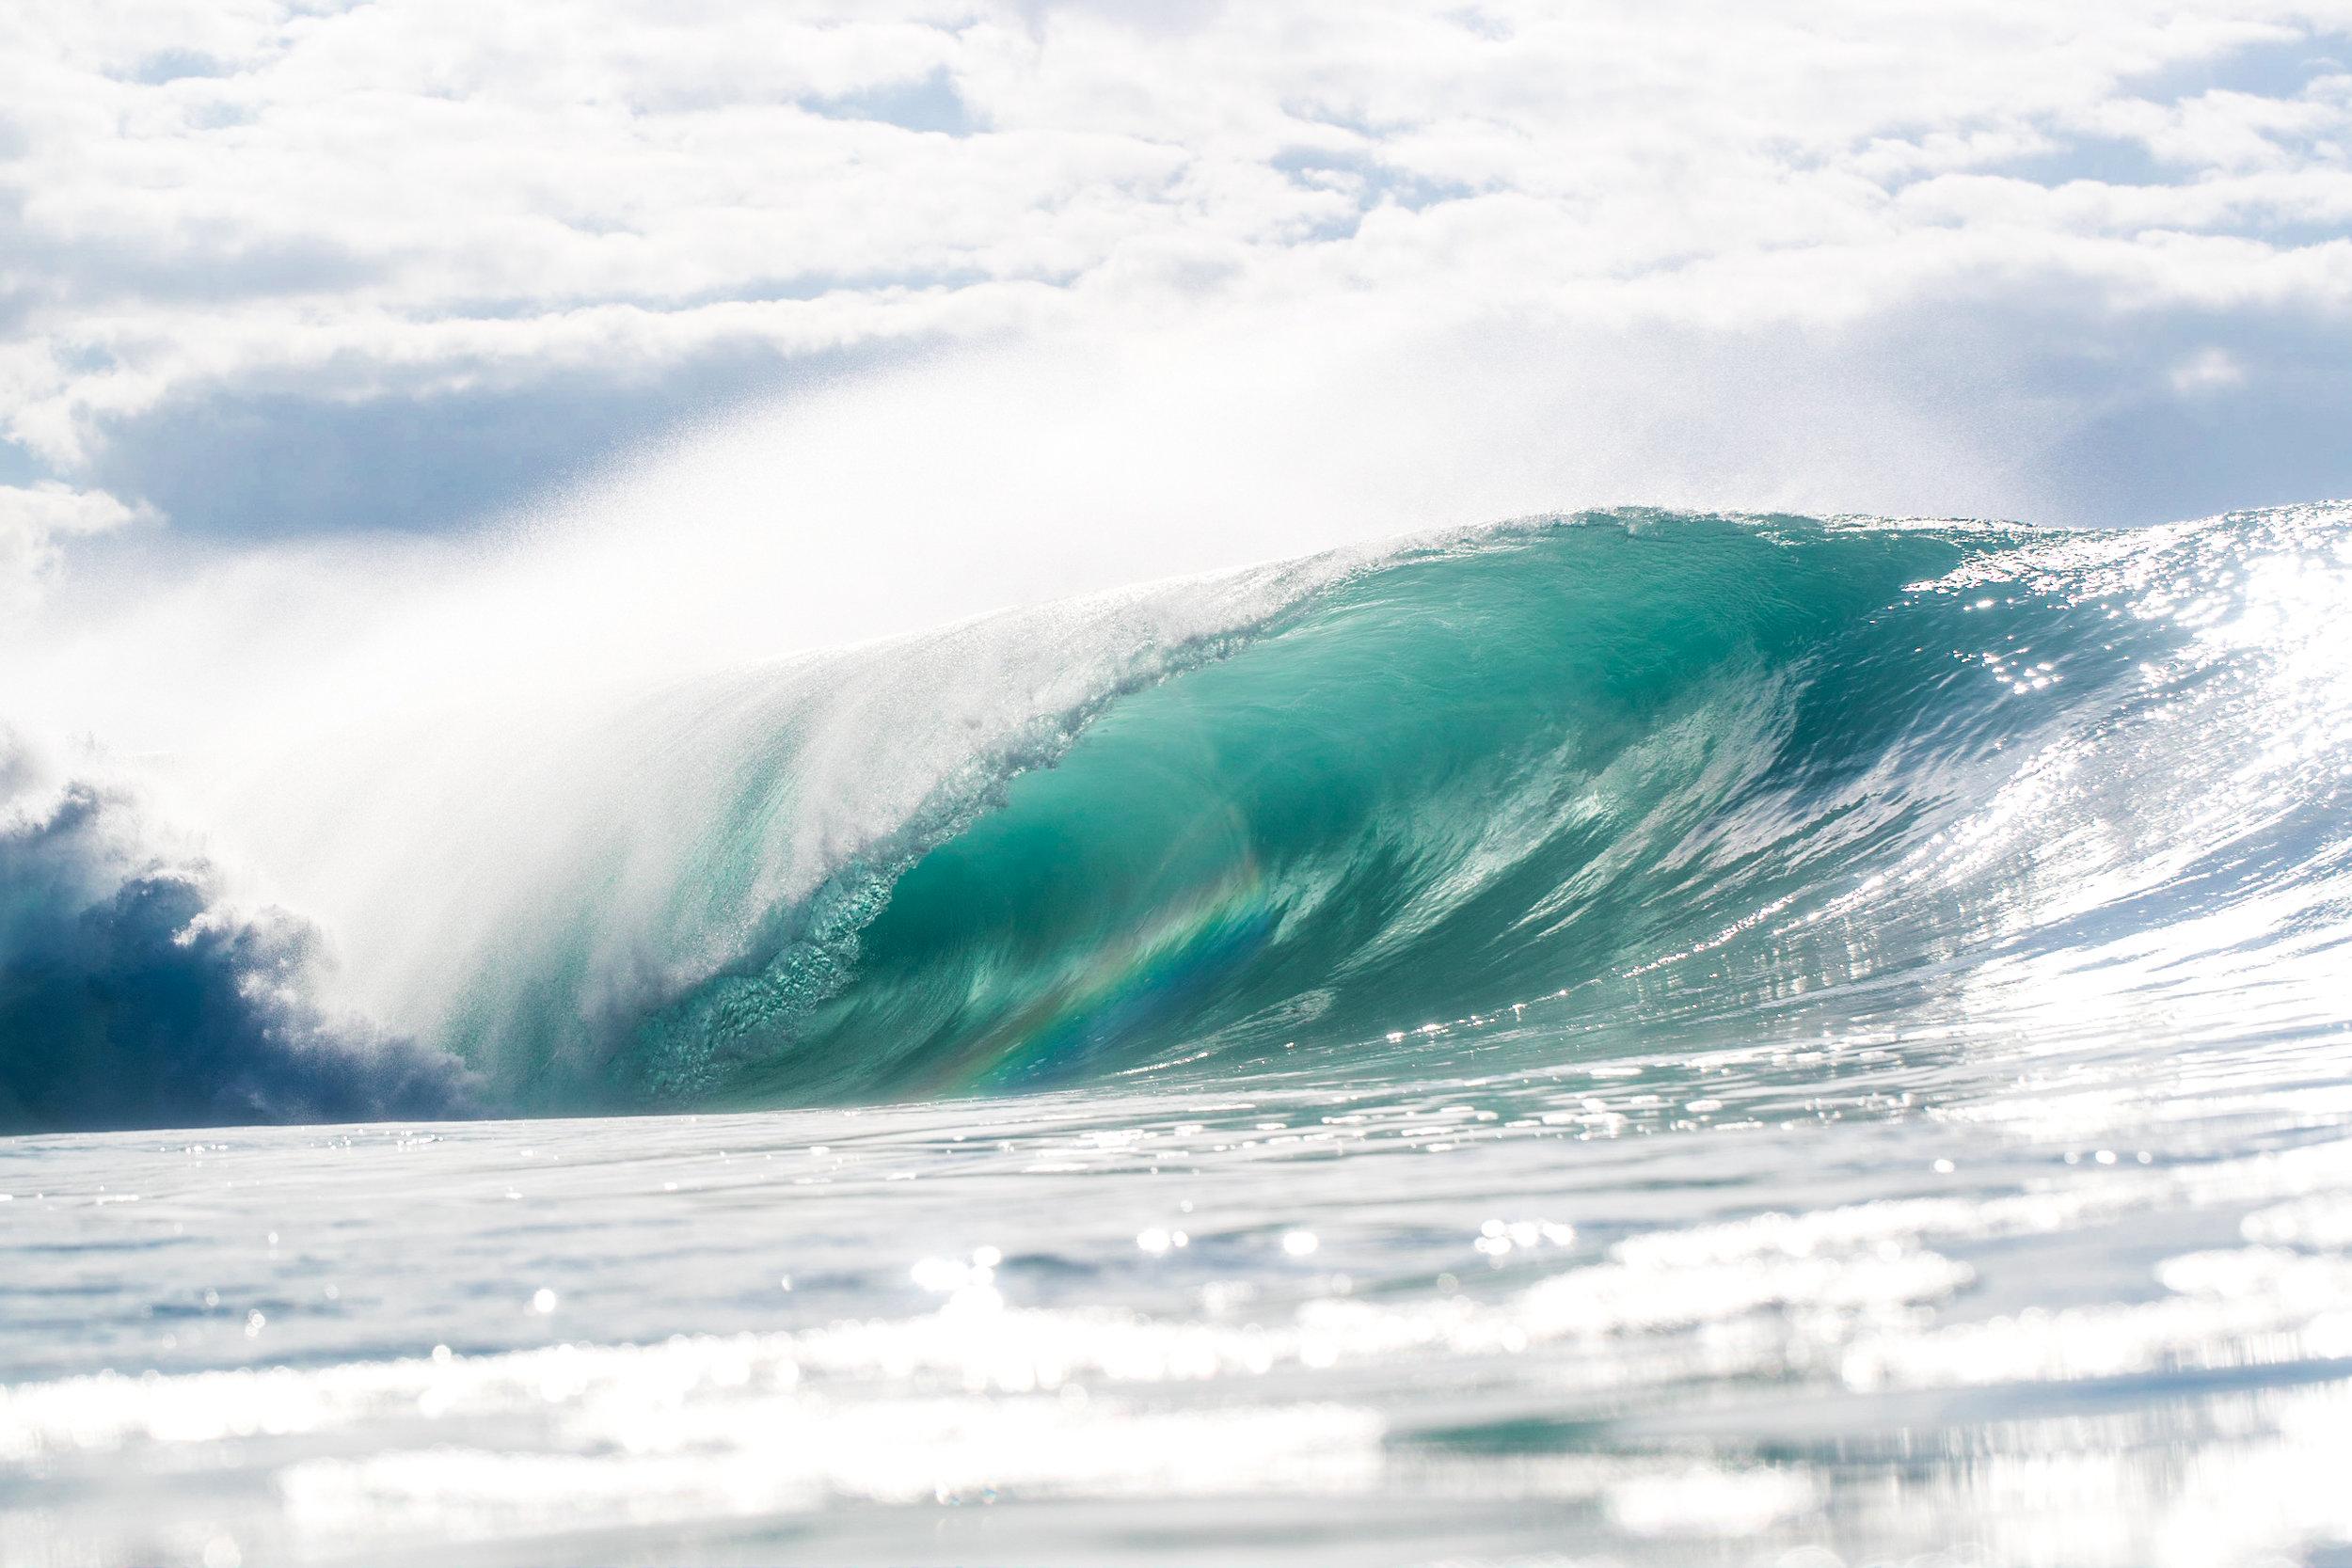 Pipeline empty wave barrel